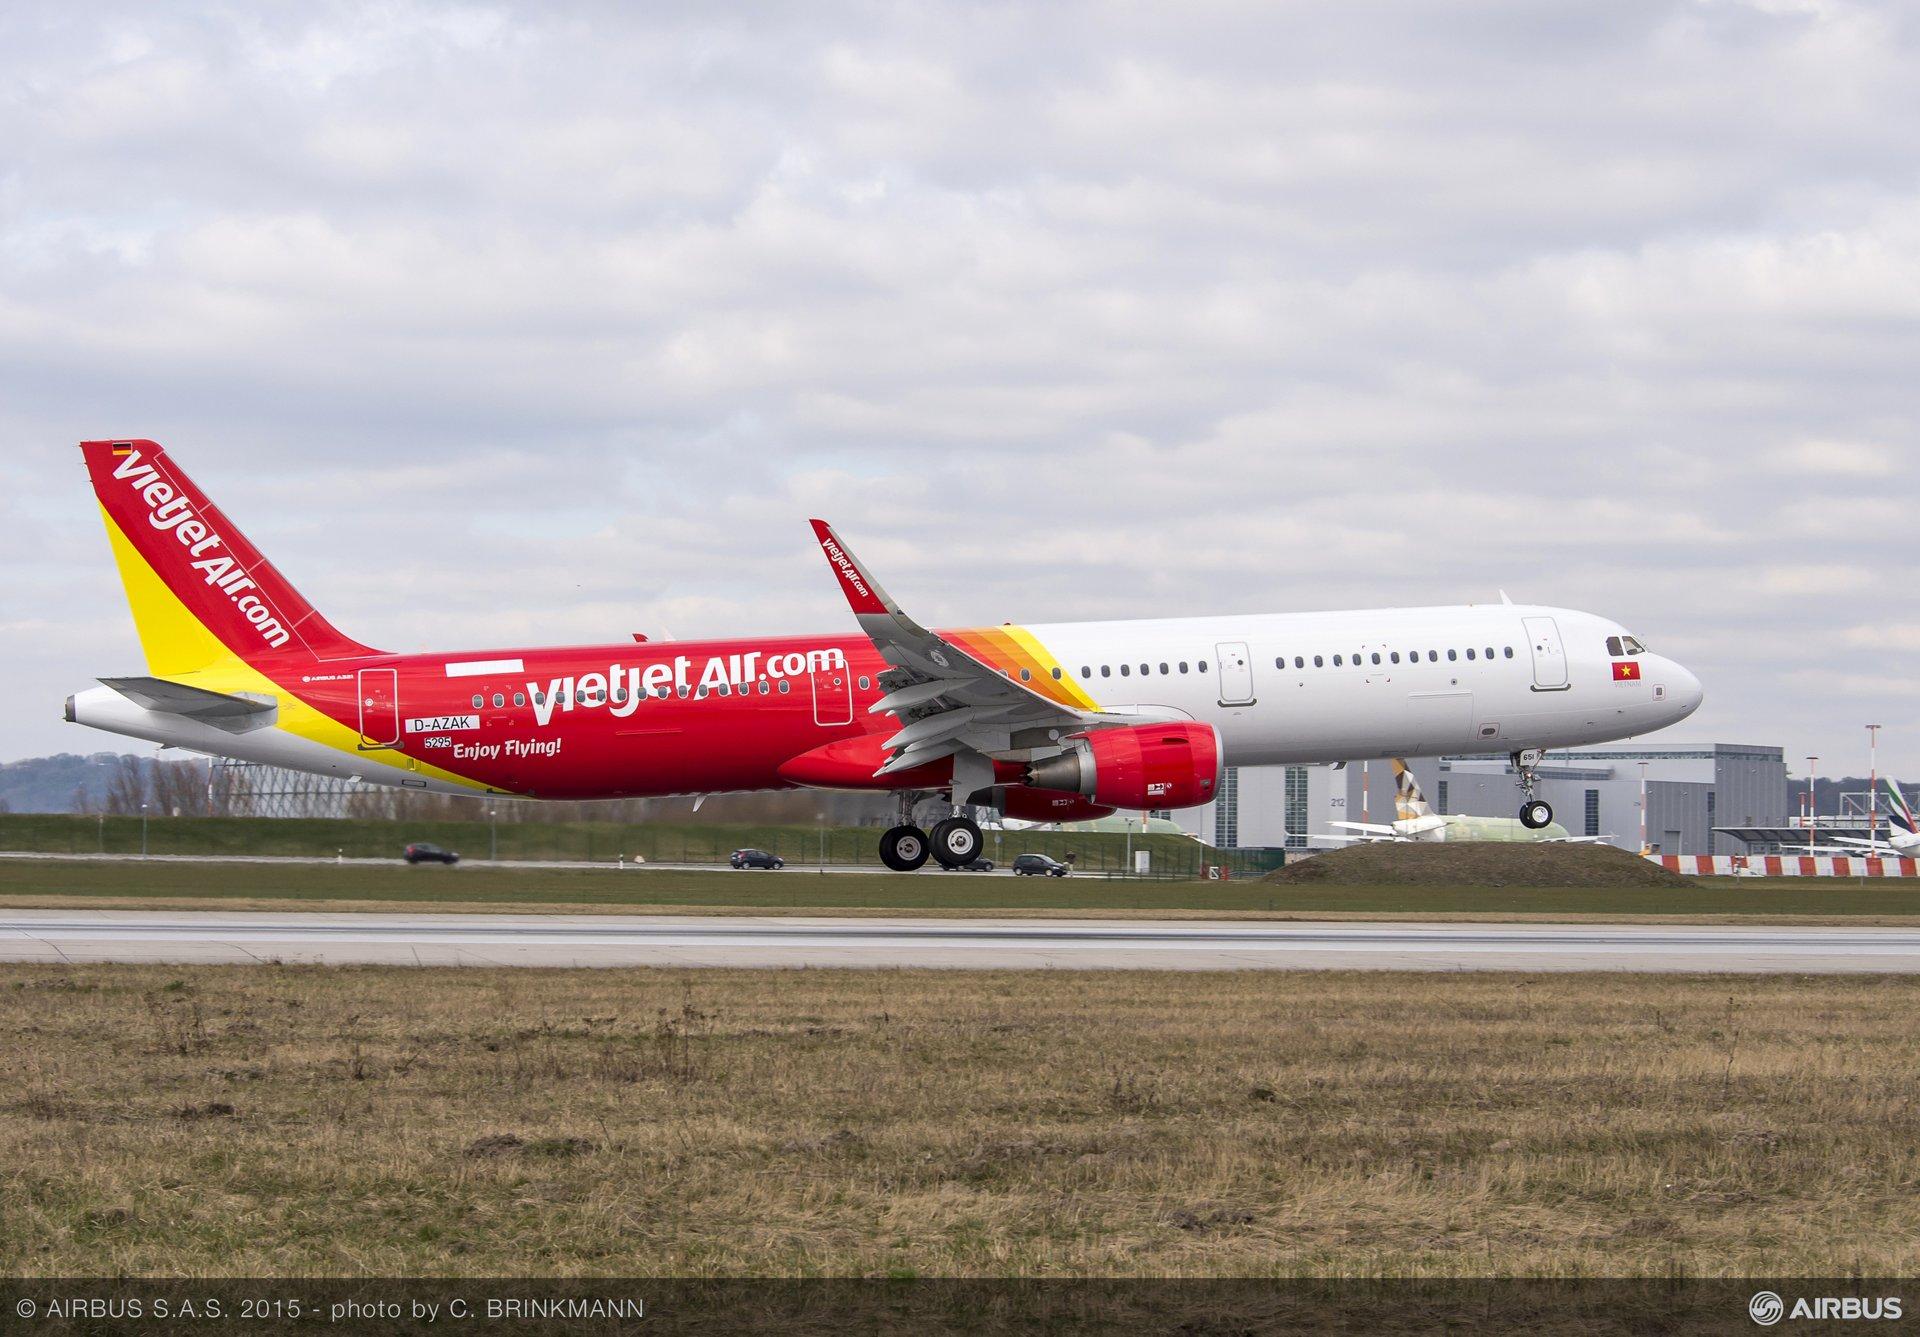 A321 VIETJET AIR MSN5295 TAKE OFF, Paris Air Show 2015_VietJetAir A321 firm order 6